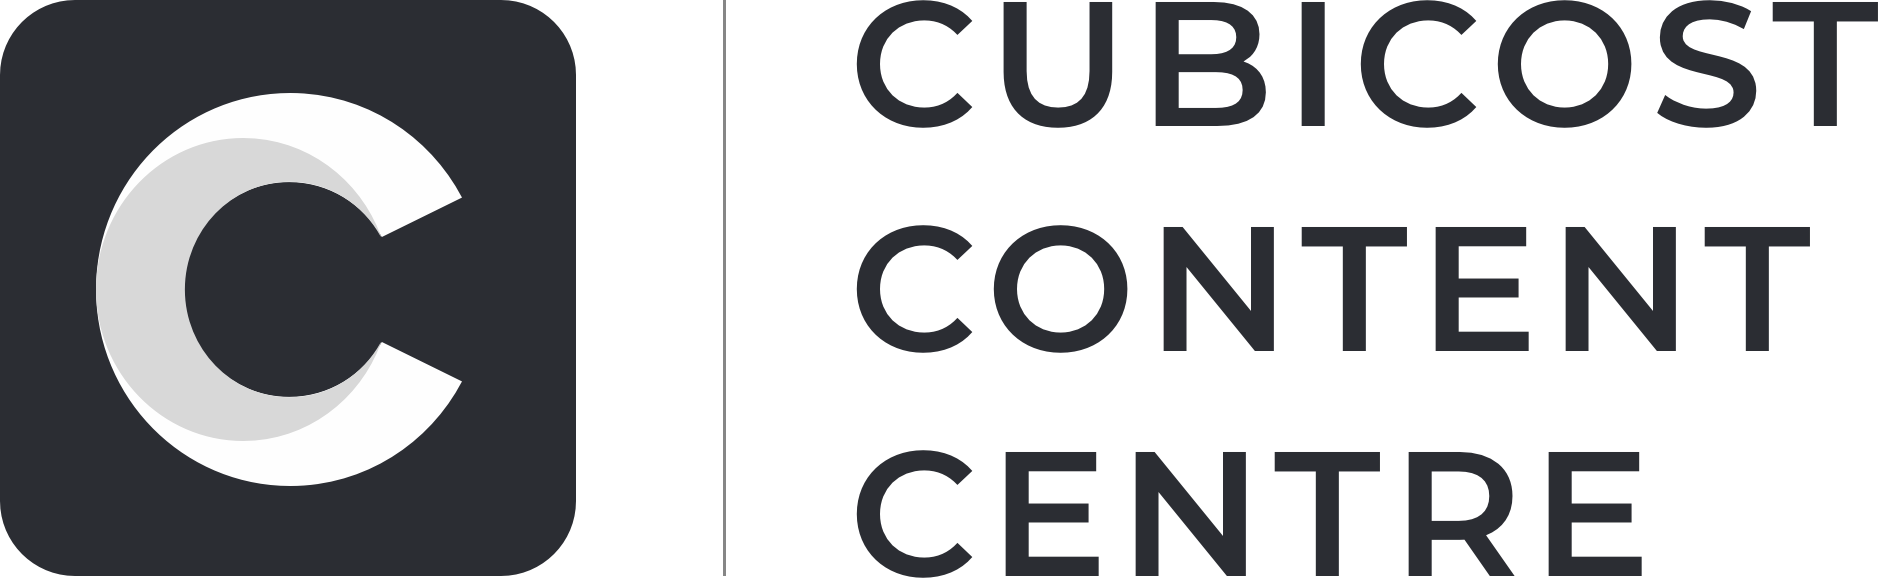 ccc-logo2